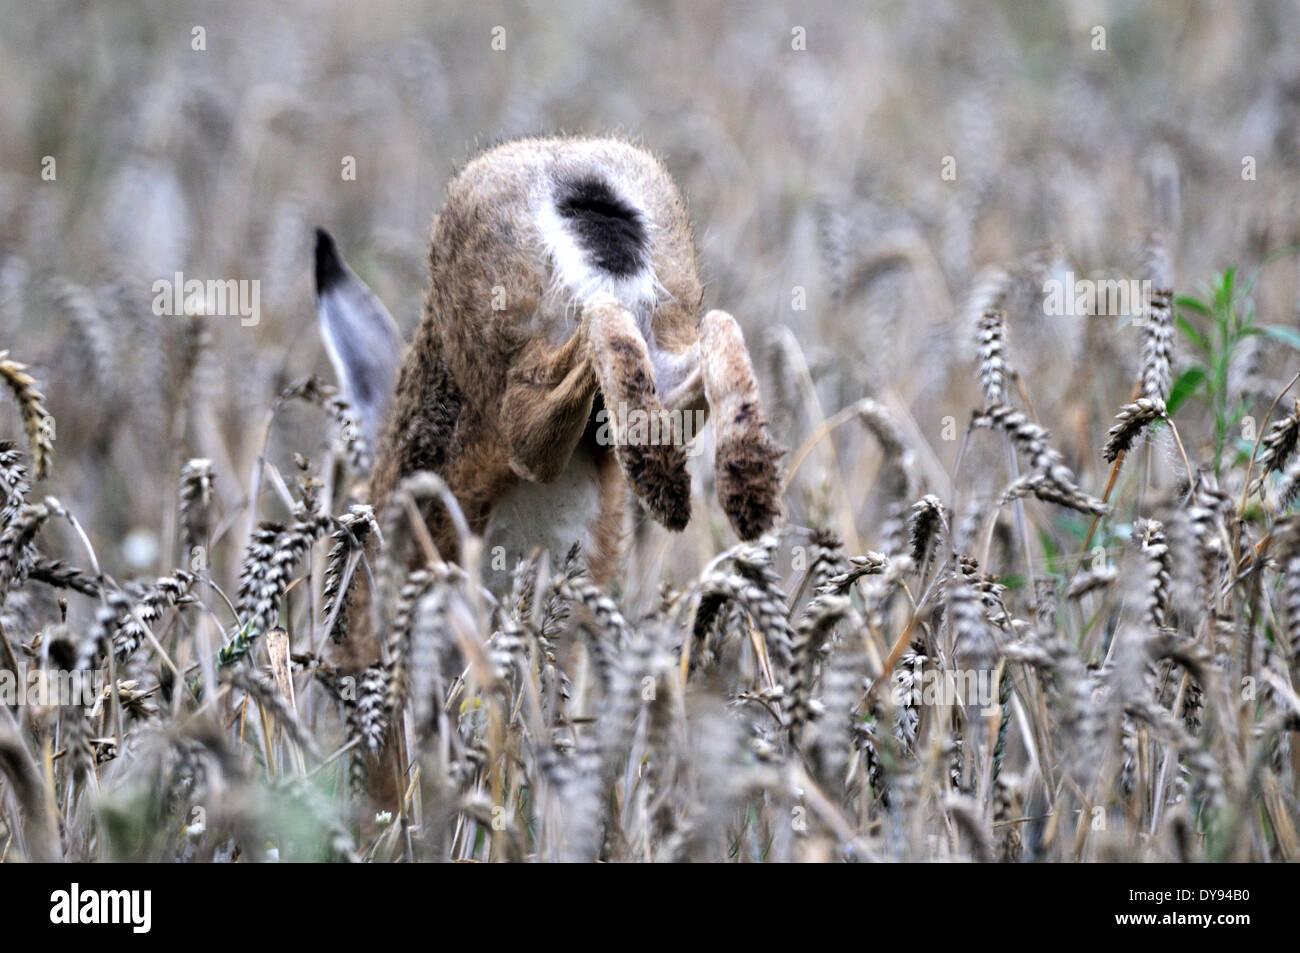 Hare, Rabbit, Lepus europaeus Pallas, brown hare, bunny, animal, animals, Germany, Europe, - Stock Image